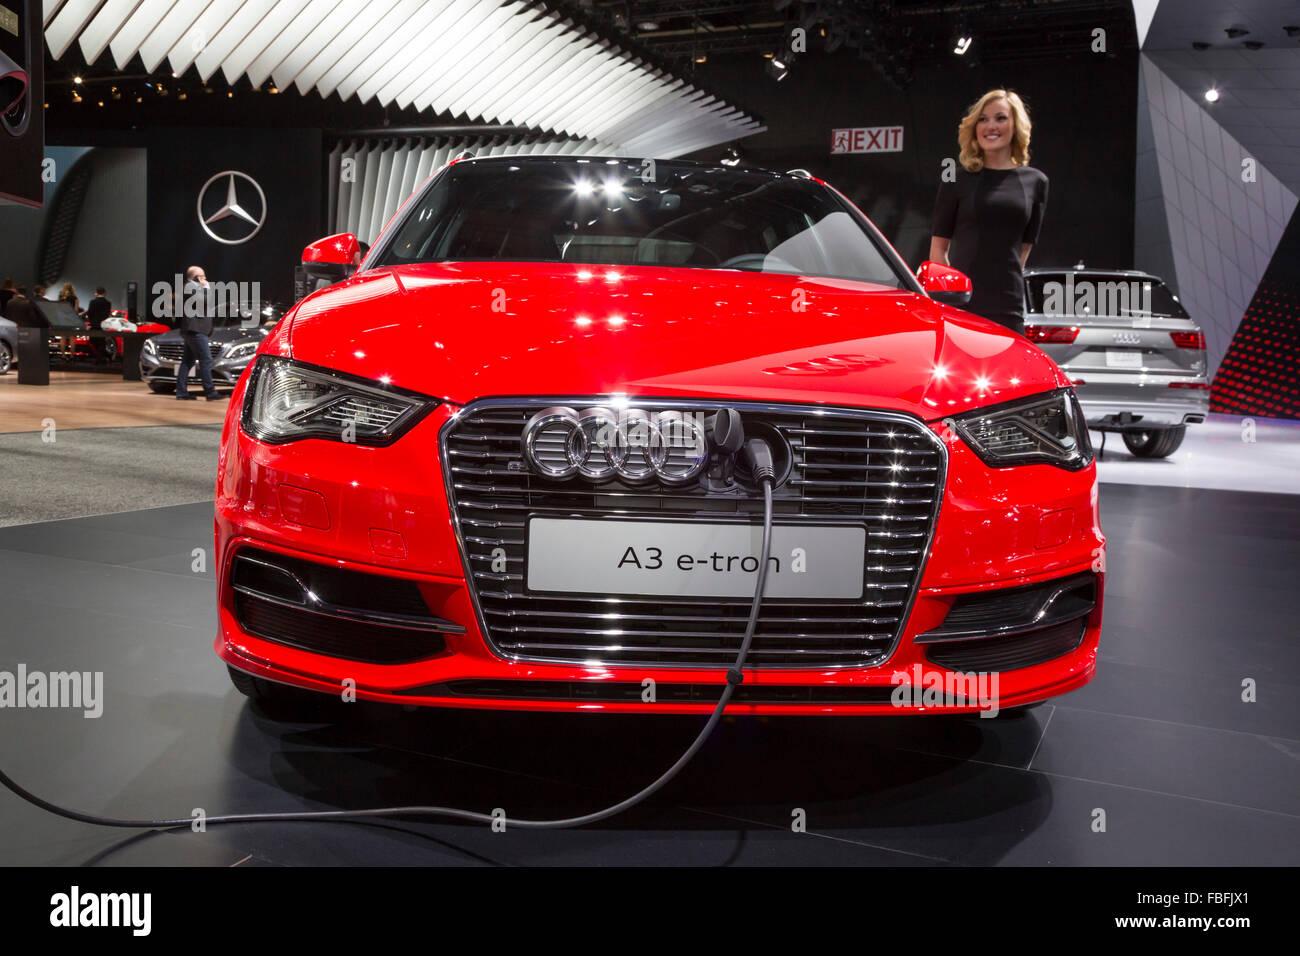 Detroit Michigan The Audi A3 E Tron Plug In Hybrid Electric Car